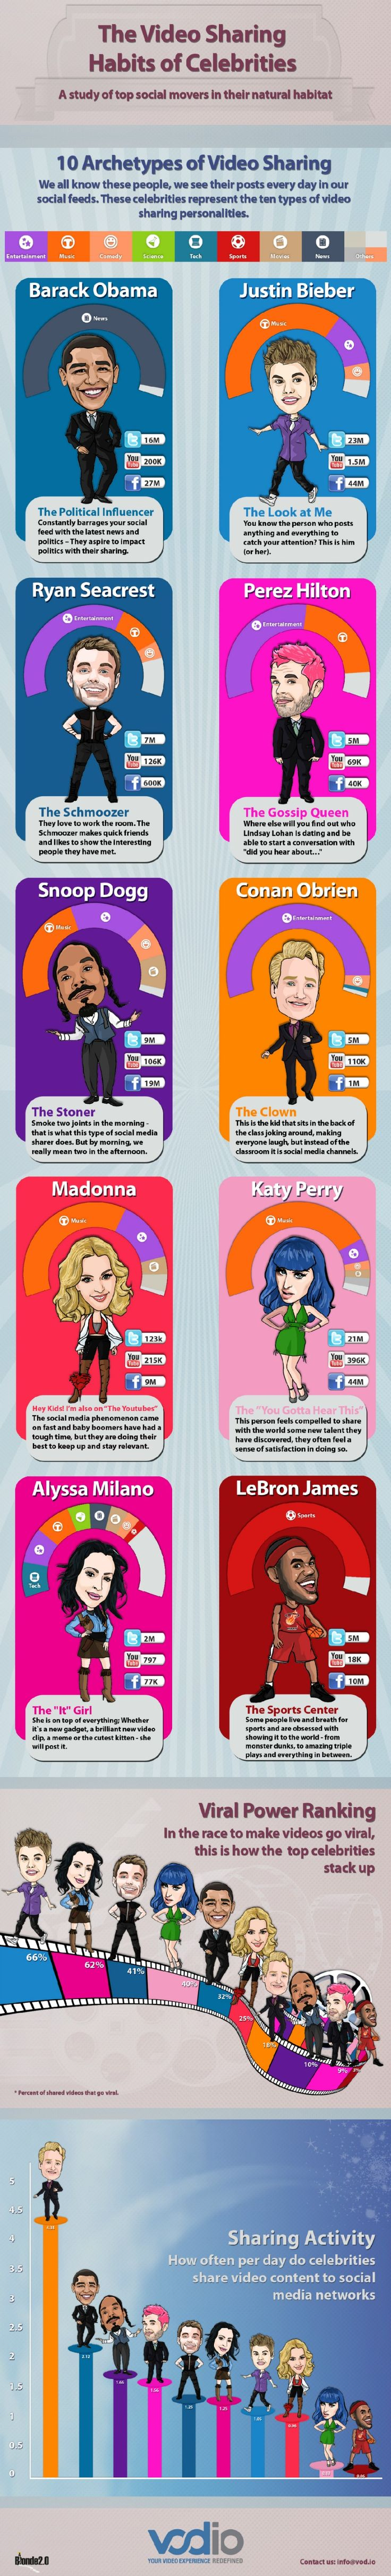 How Social Media Savvy Celebrities Share Video